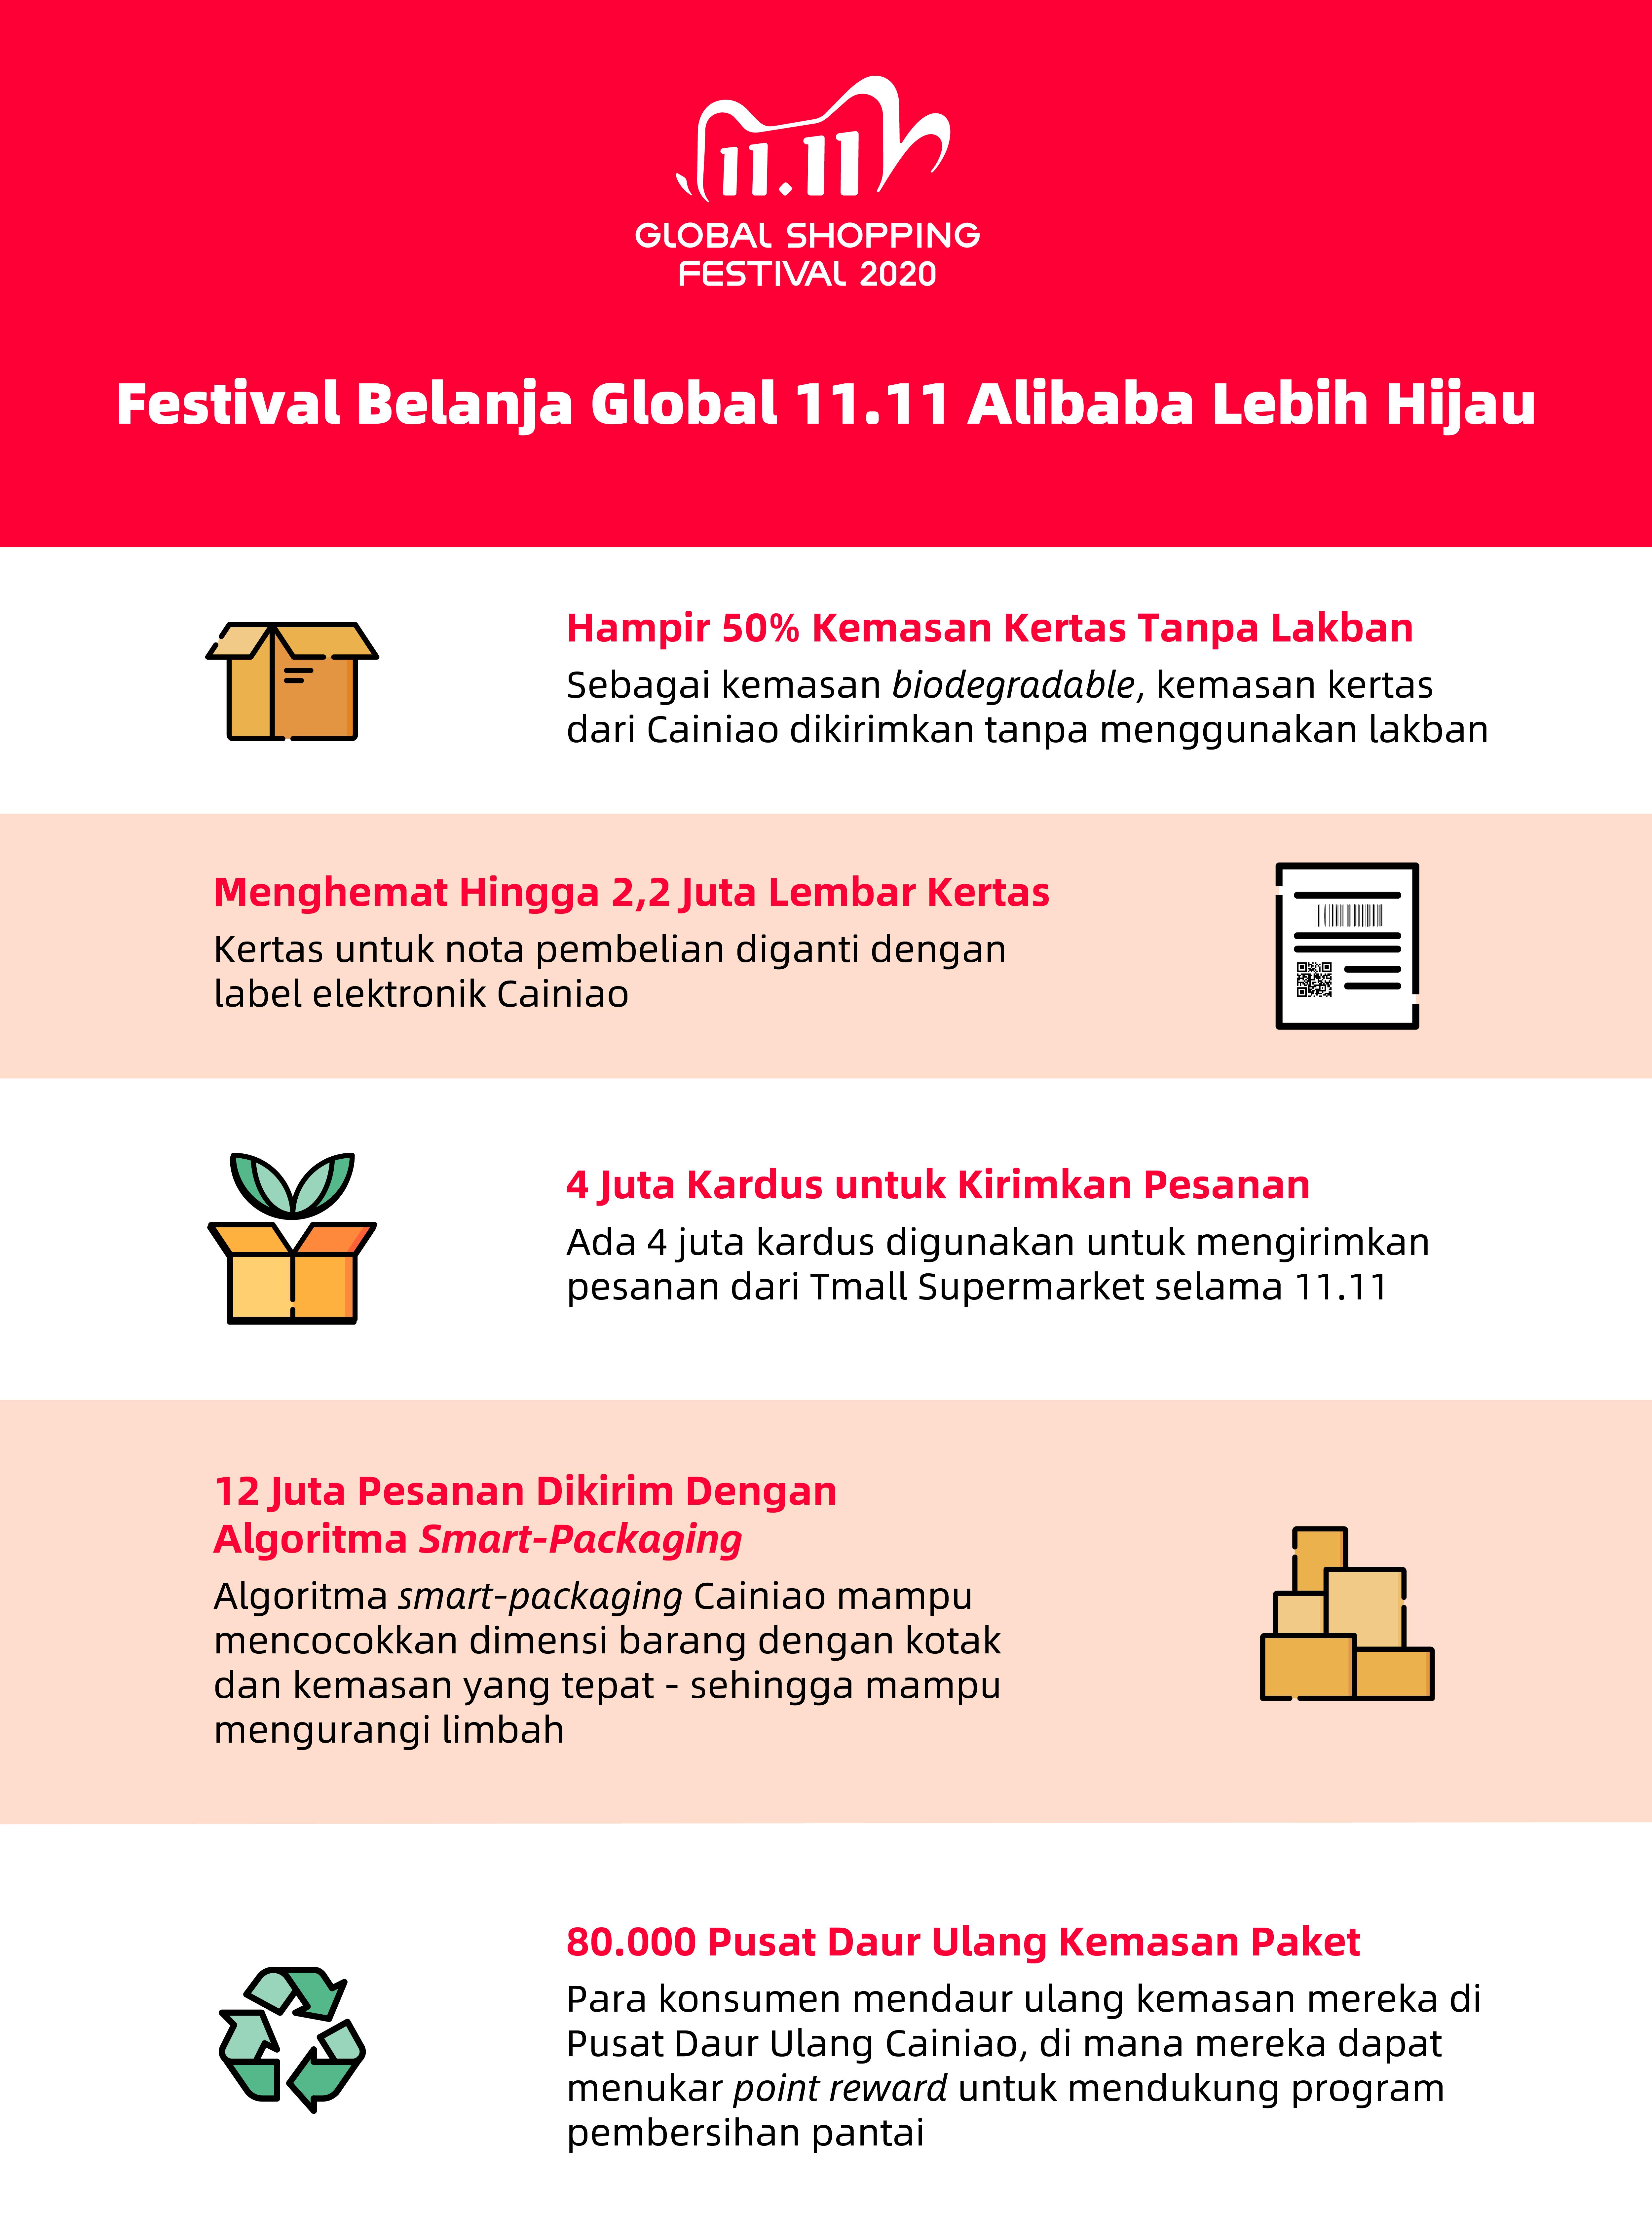 Infografis-Alibaba-11.11-Lebih-hijau-2020